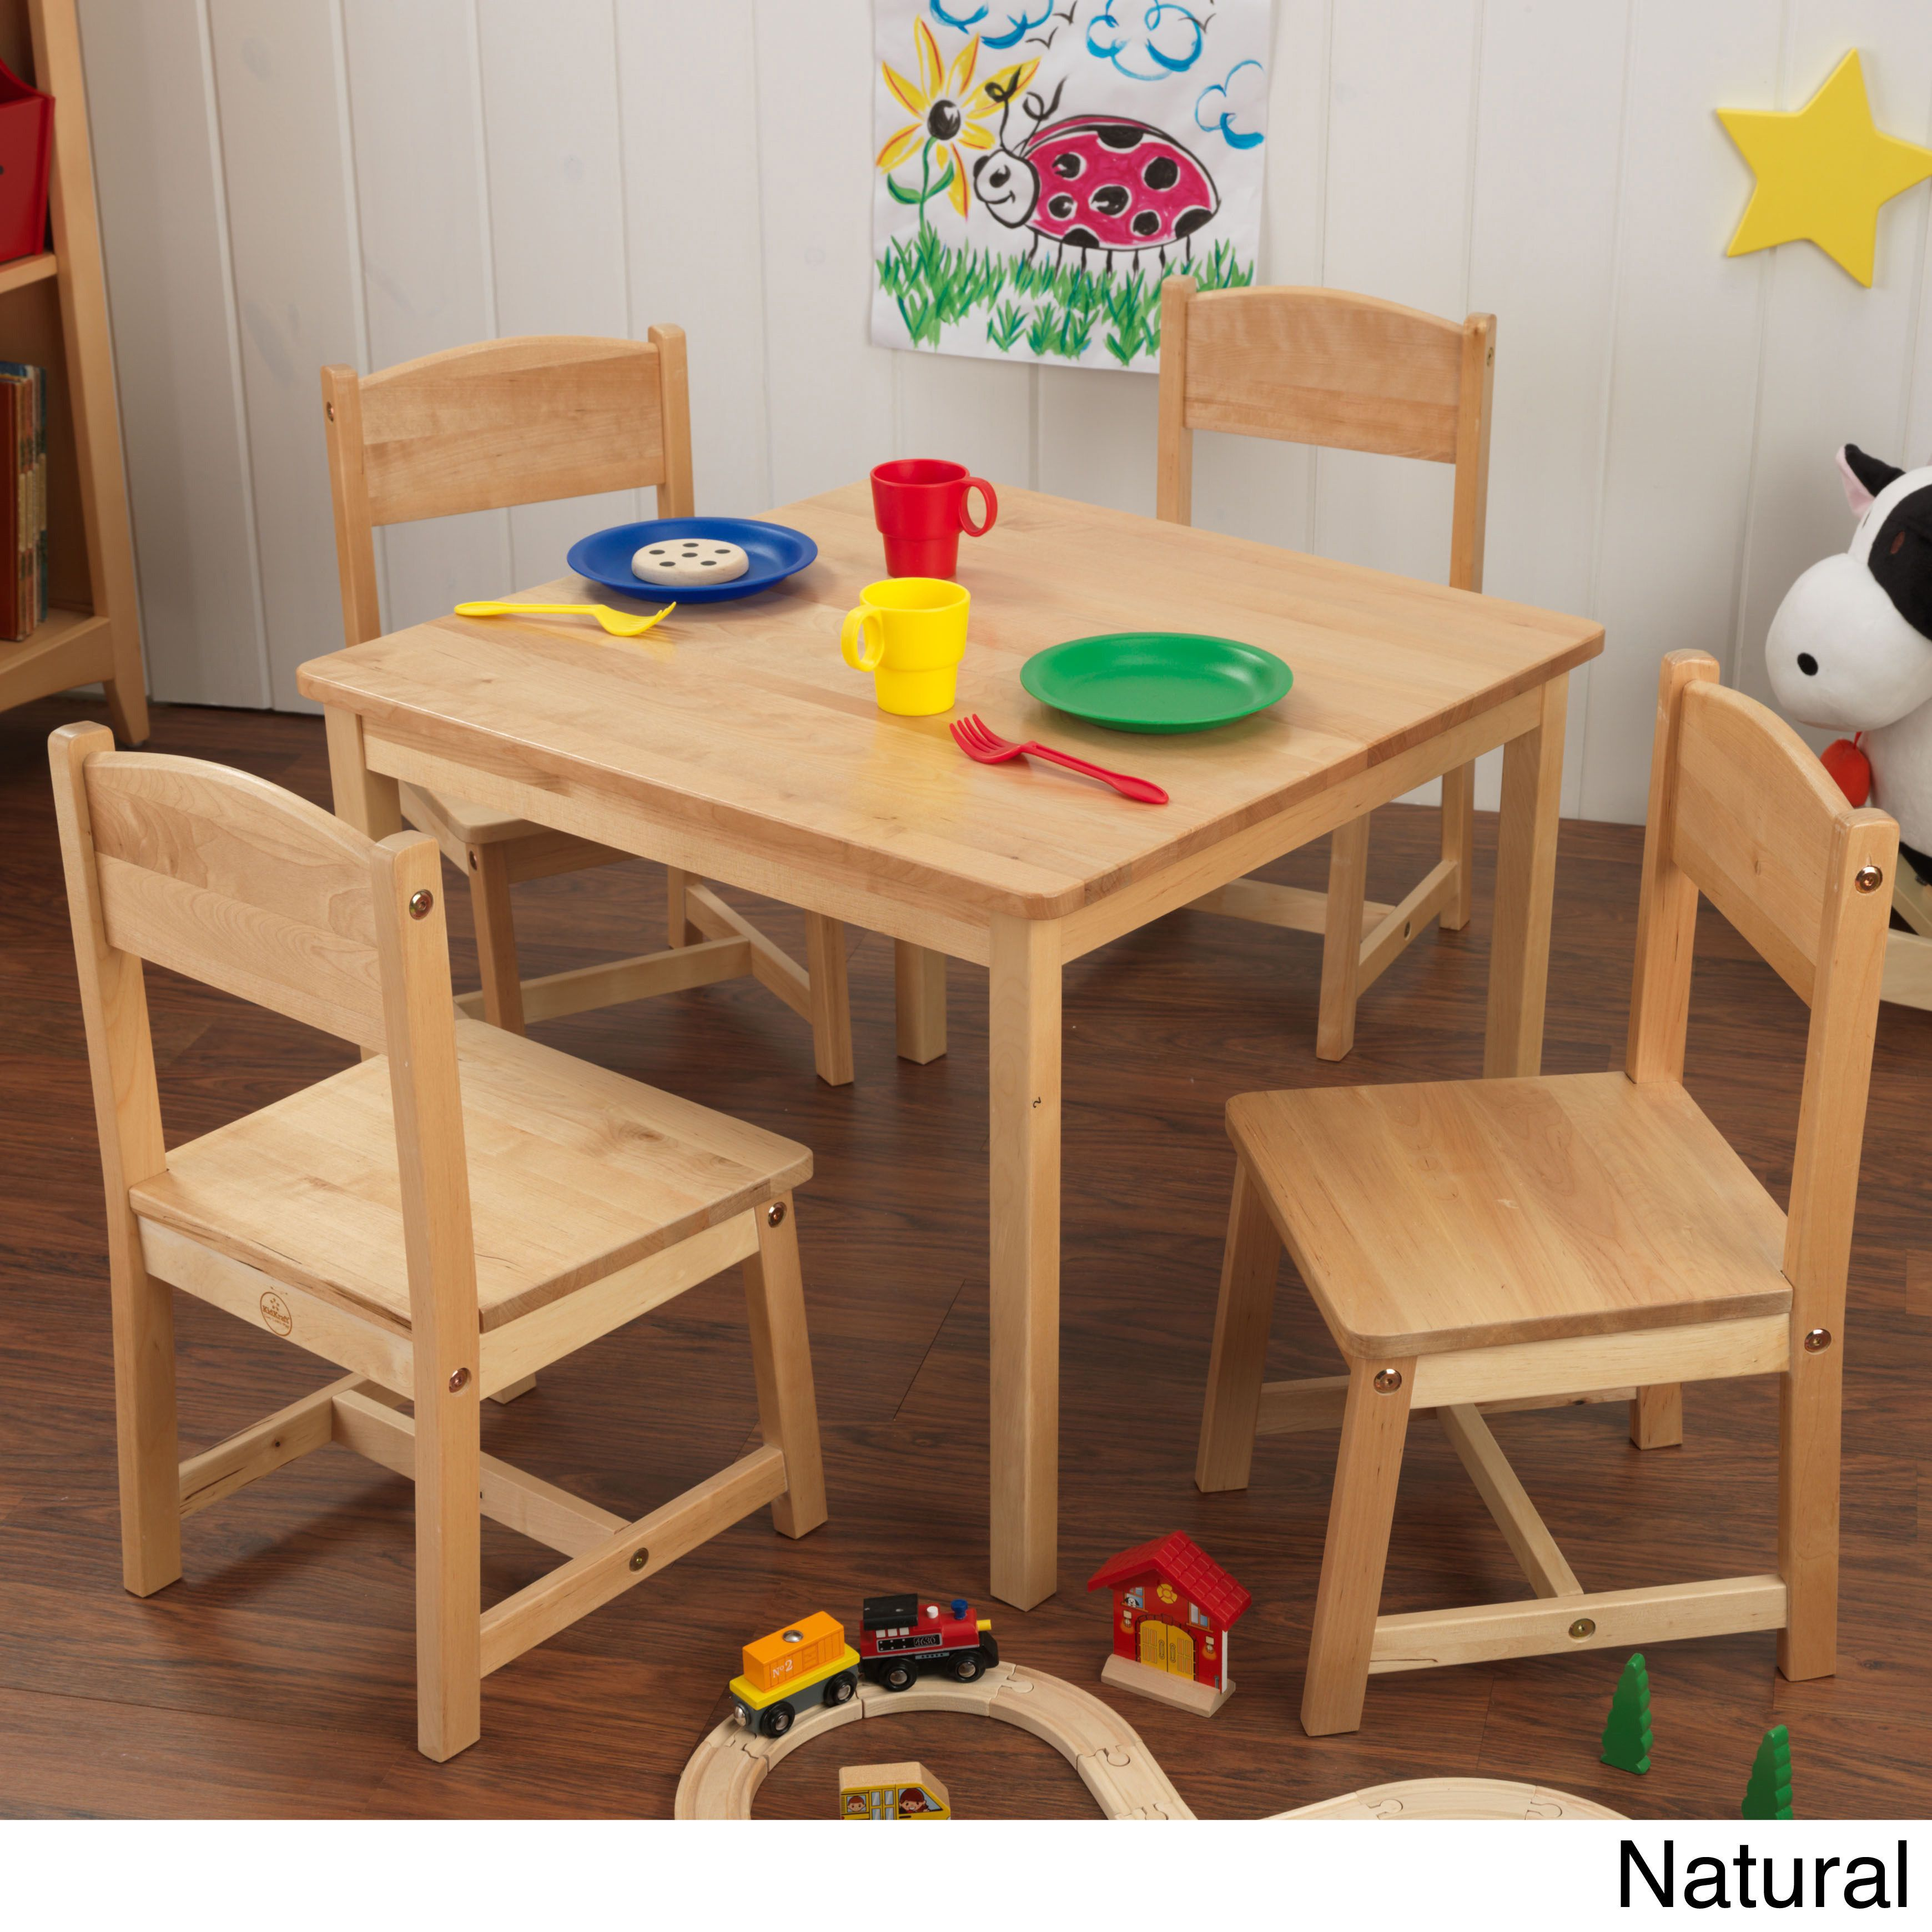 Kidkraft Farmhouse 5 Piece Table And Chairs Set Espresso Finish